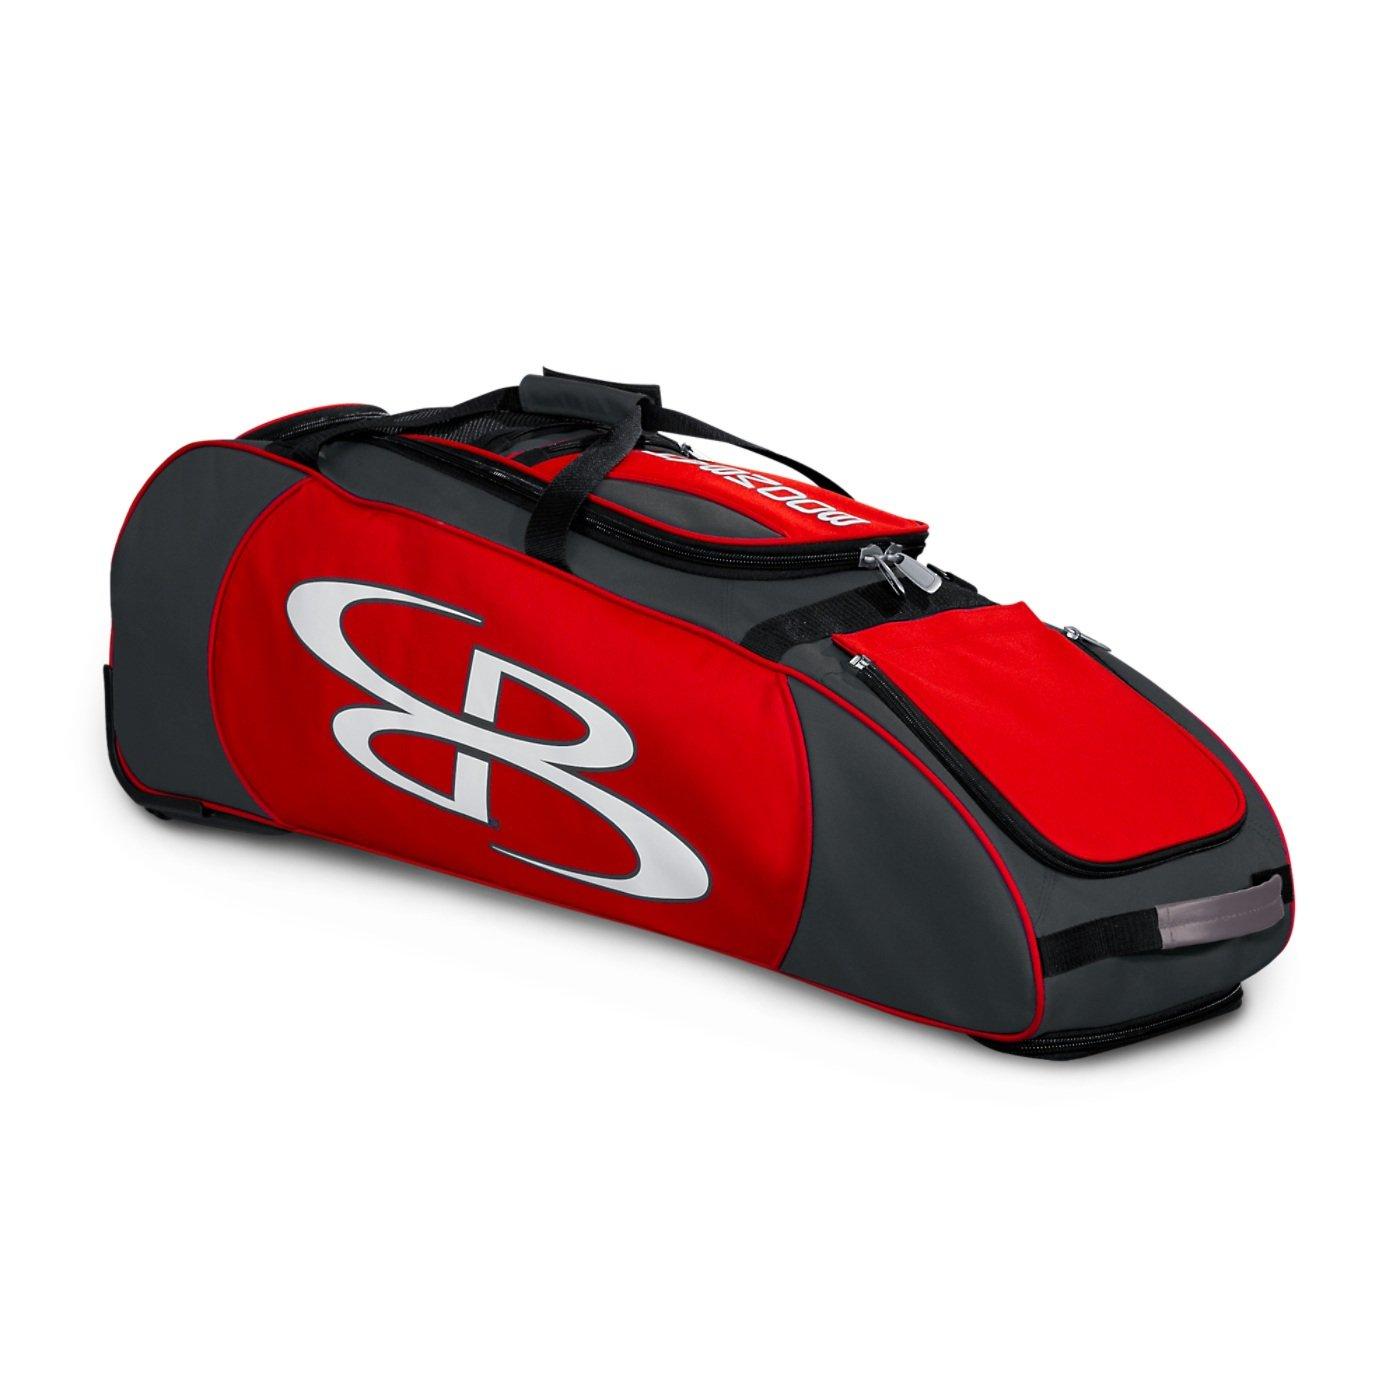 Boombah Spartan ローリングバットバッグ 野球用 ソフトボール用 38インチ×12-1/2インチ×12インチ 43種類のカラーオプション 4本のバット他 B01NACPBNU Dark Charcoal/Red Dark Charcoal/Red